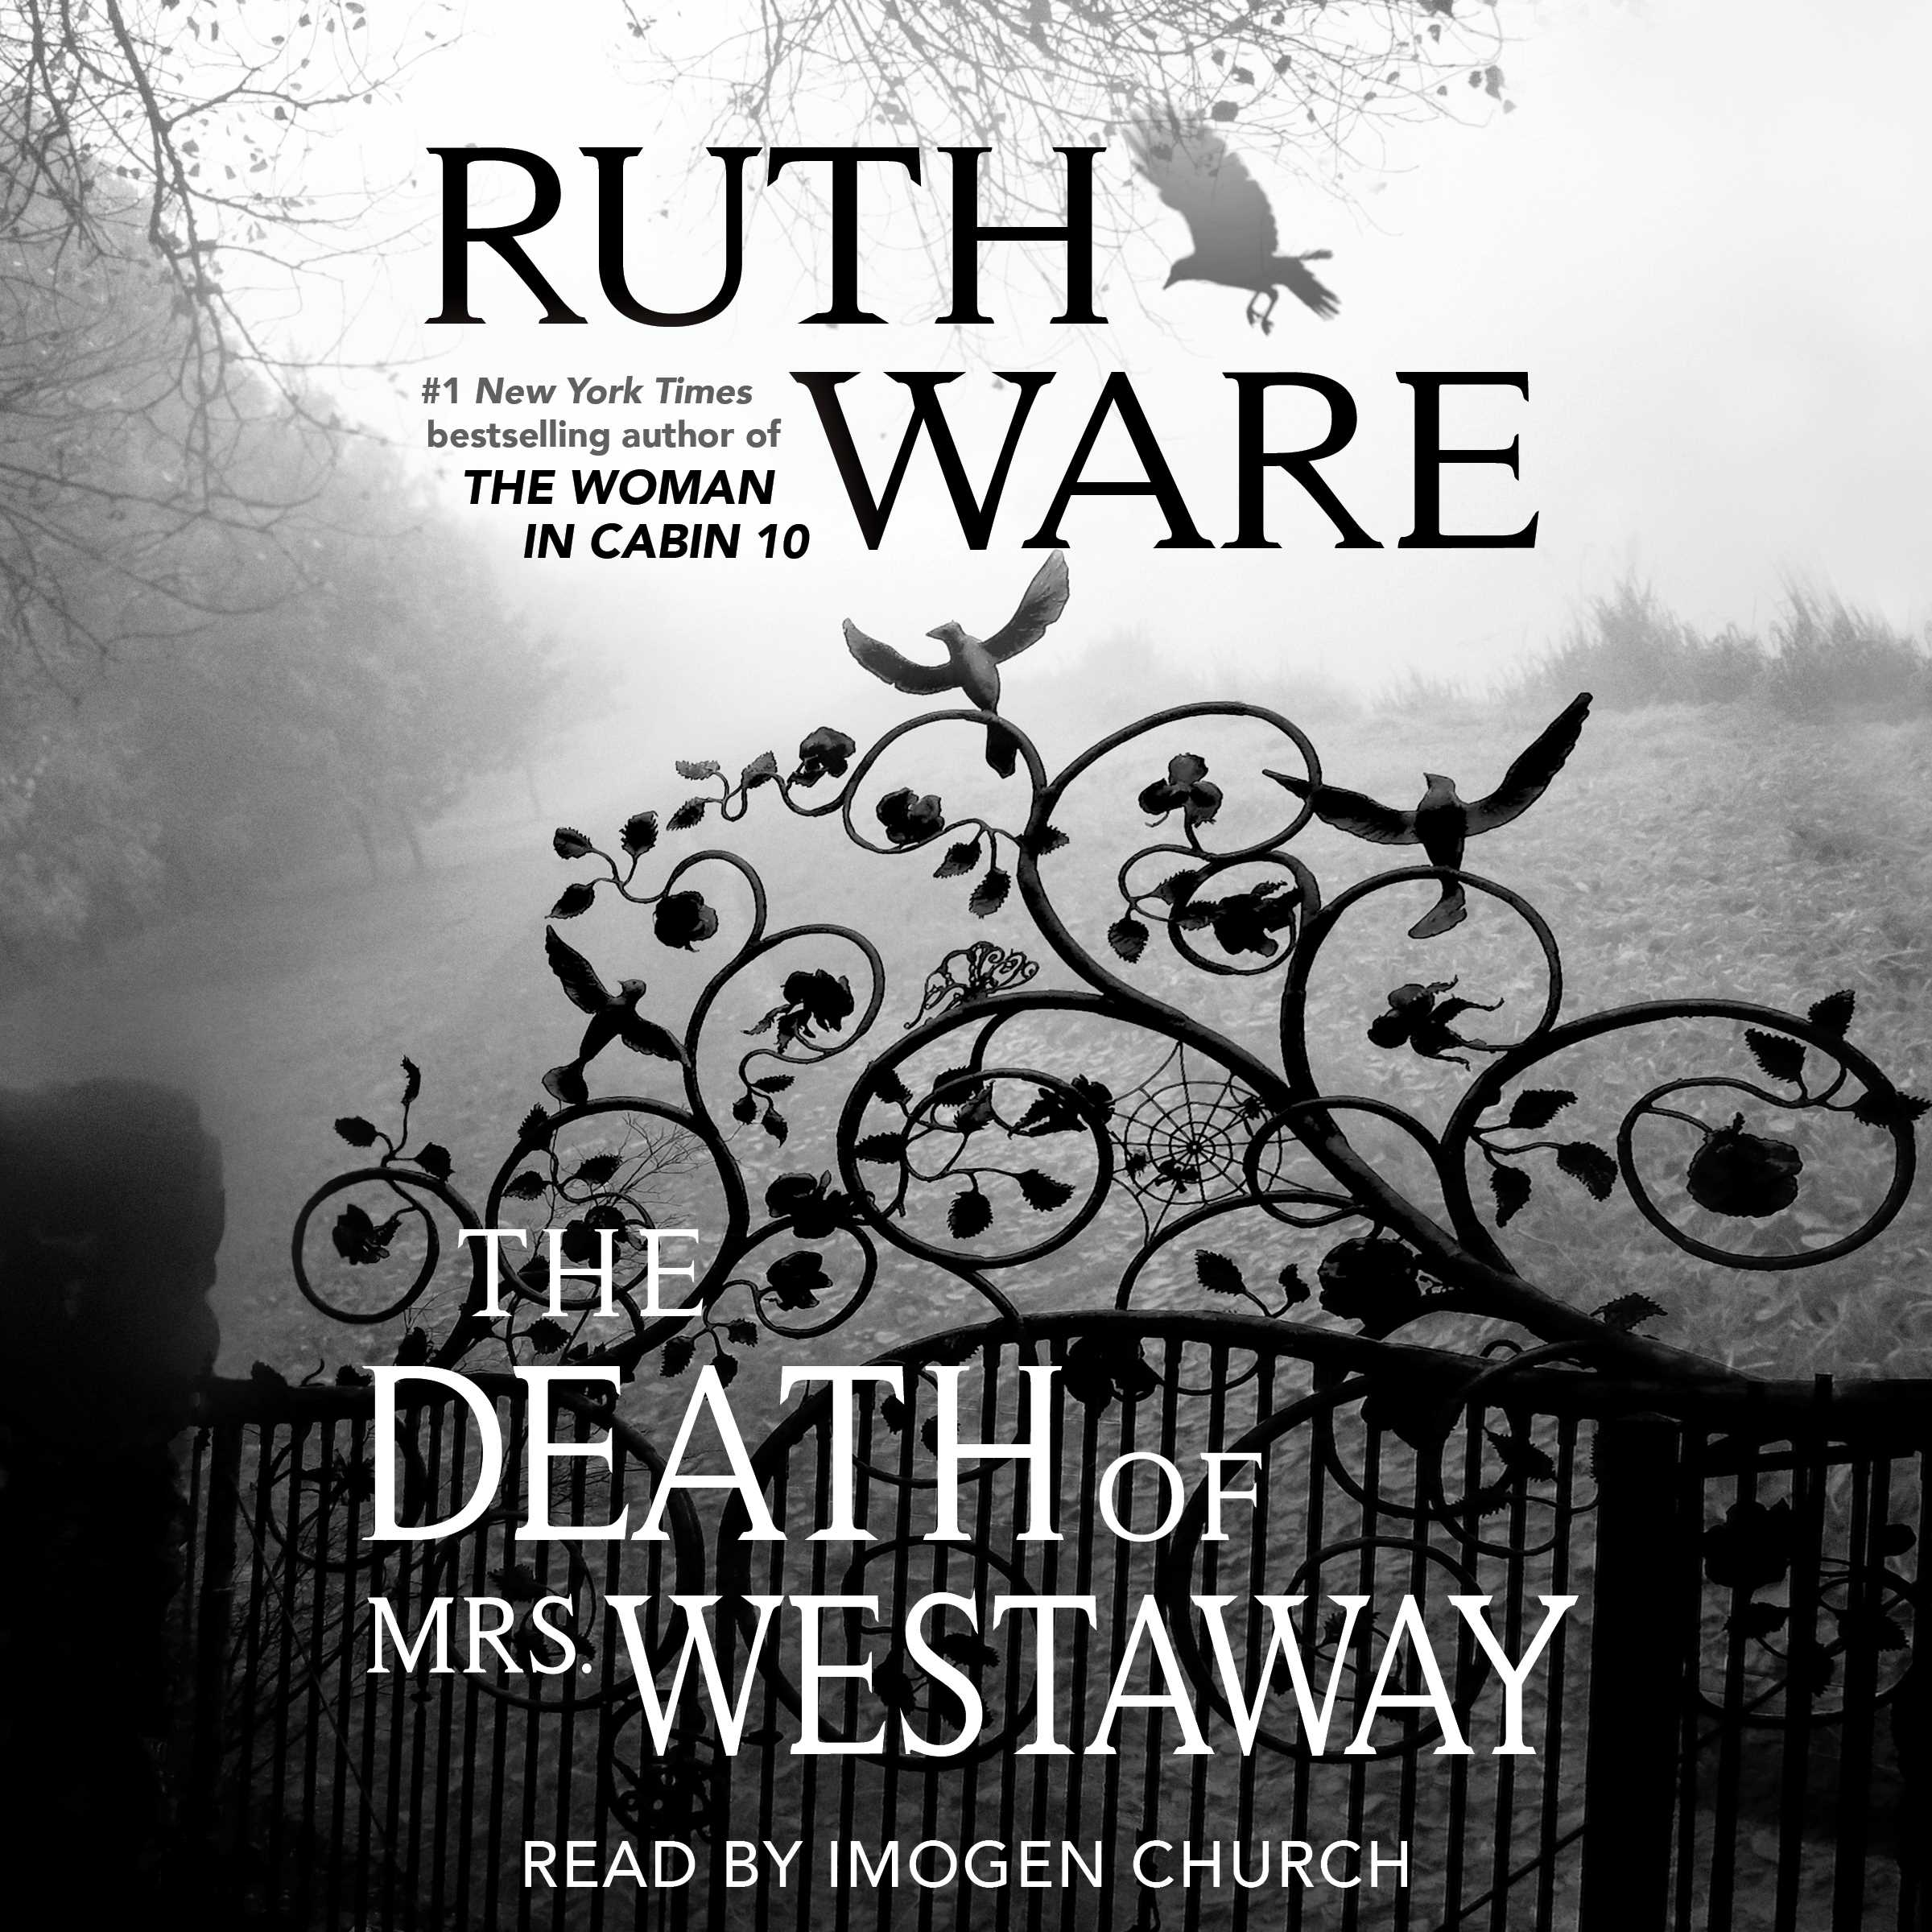 The death of mrs westaway 9781508251712 hr